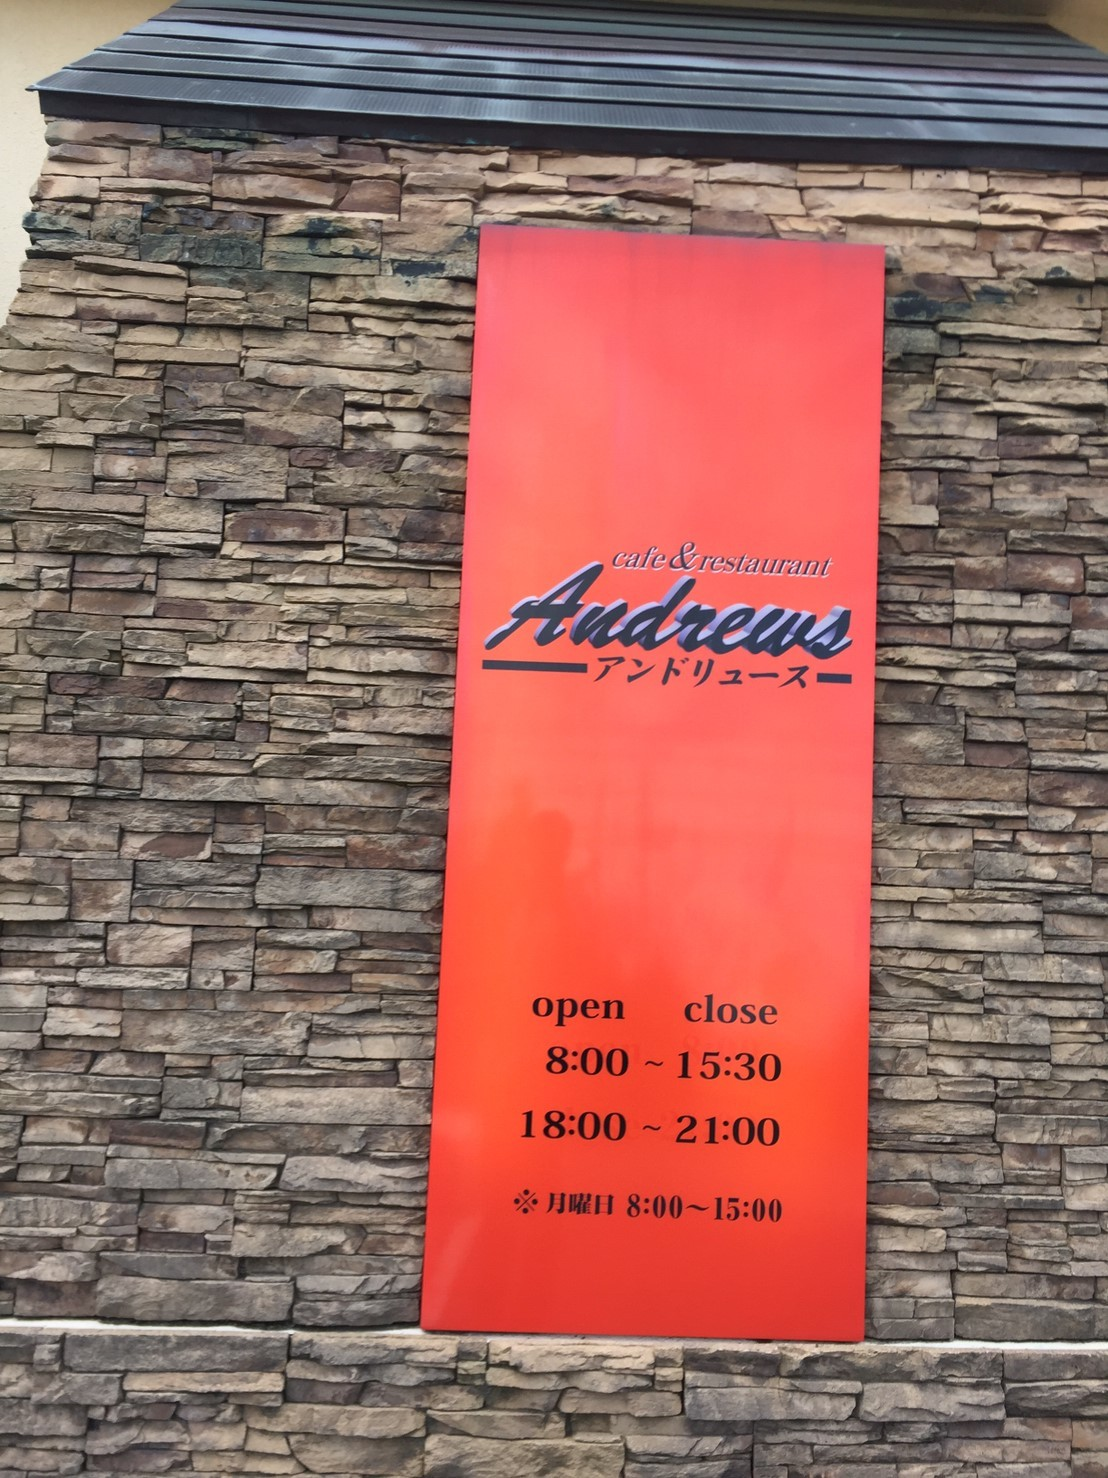 cafe & restaurant Andrews  日替わり  ジャンボ有頭海老フライ_e0115904_00362424.jpg